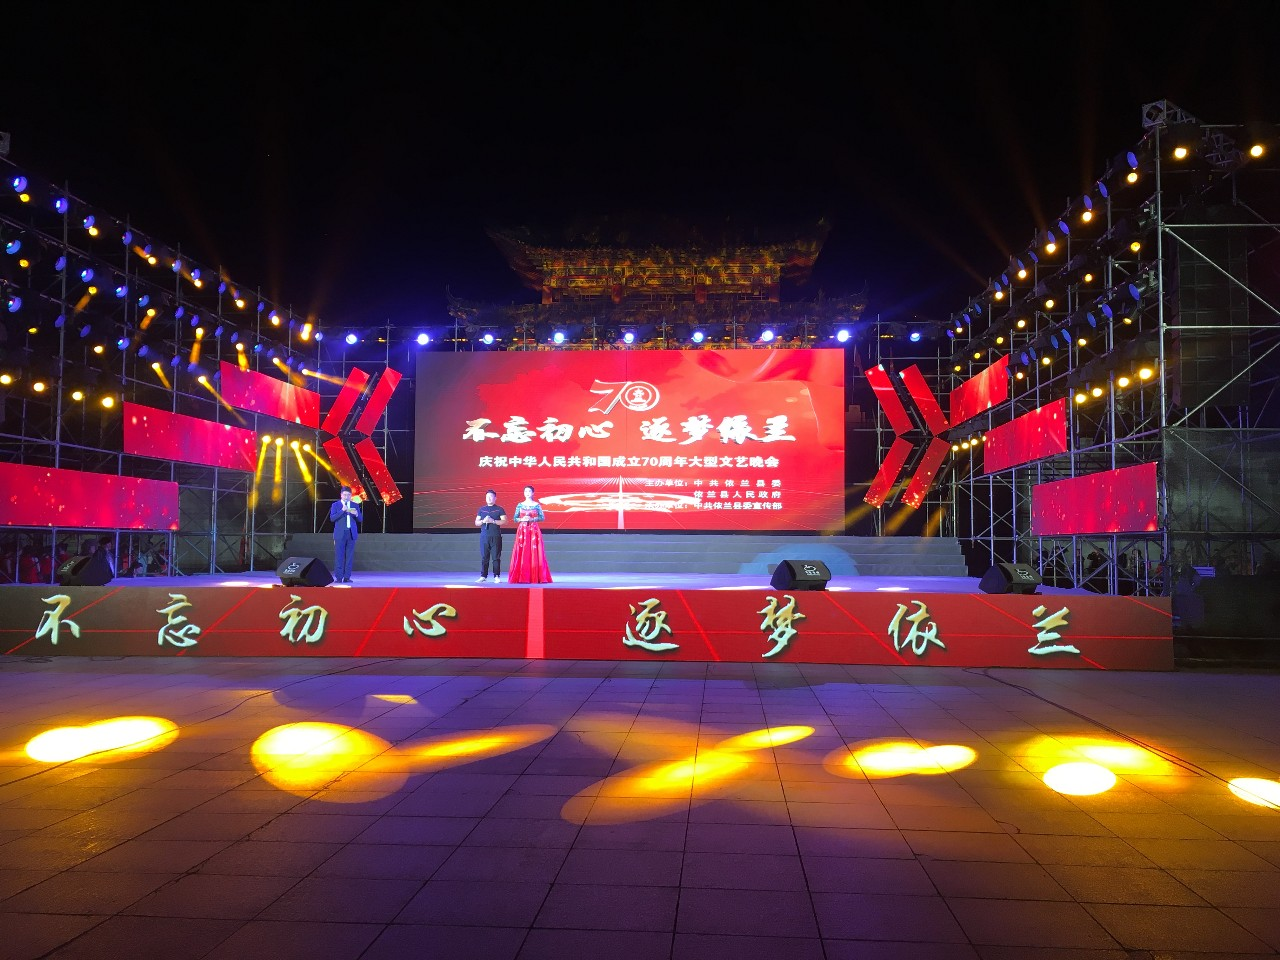 http://www.hljold.org.cn/shishangchaoliu/248068.html